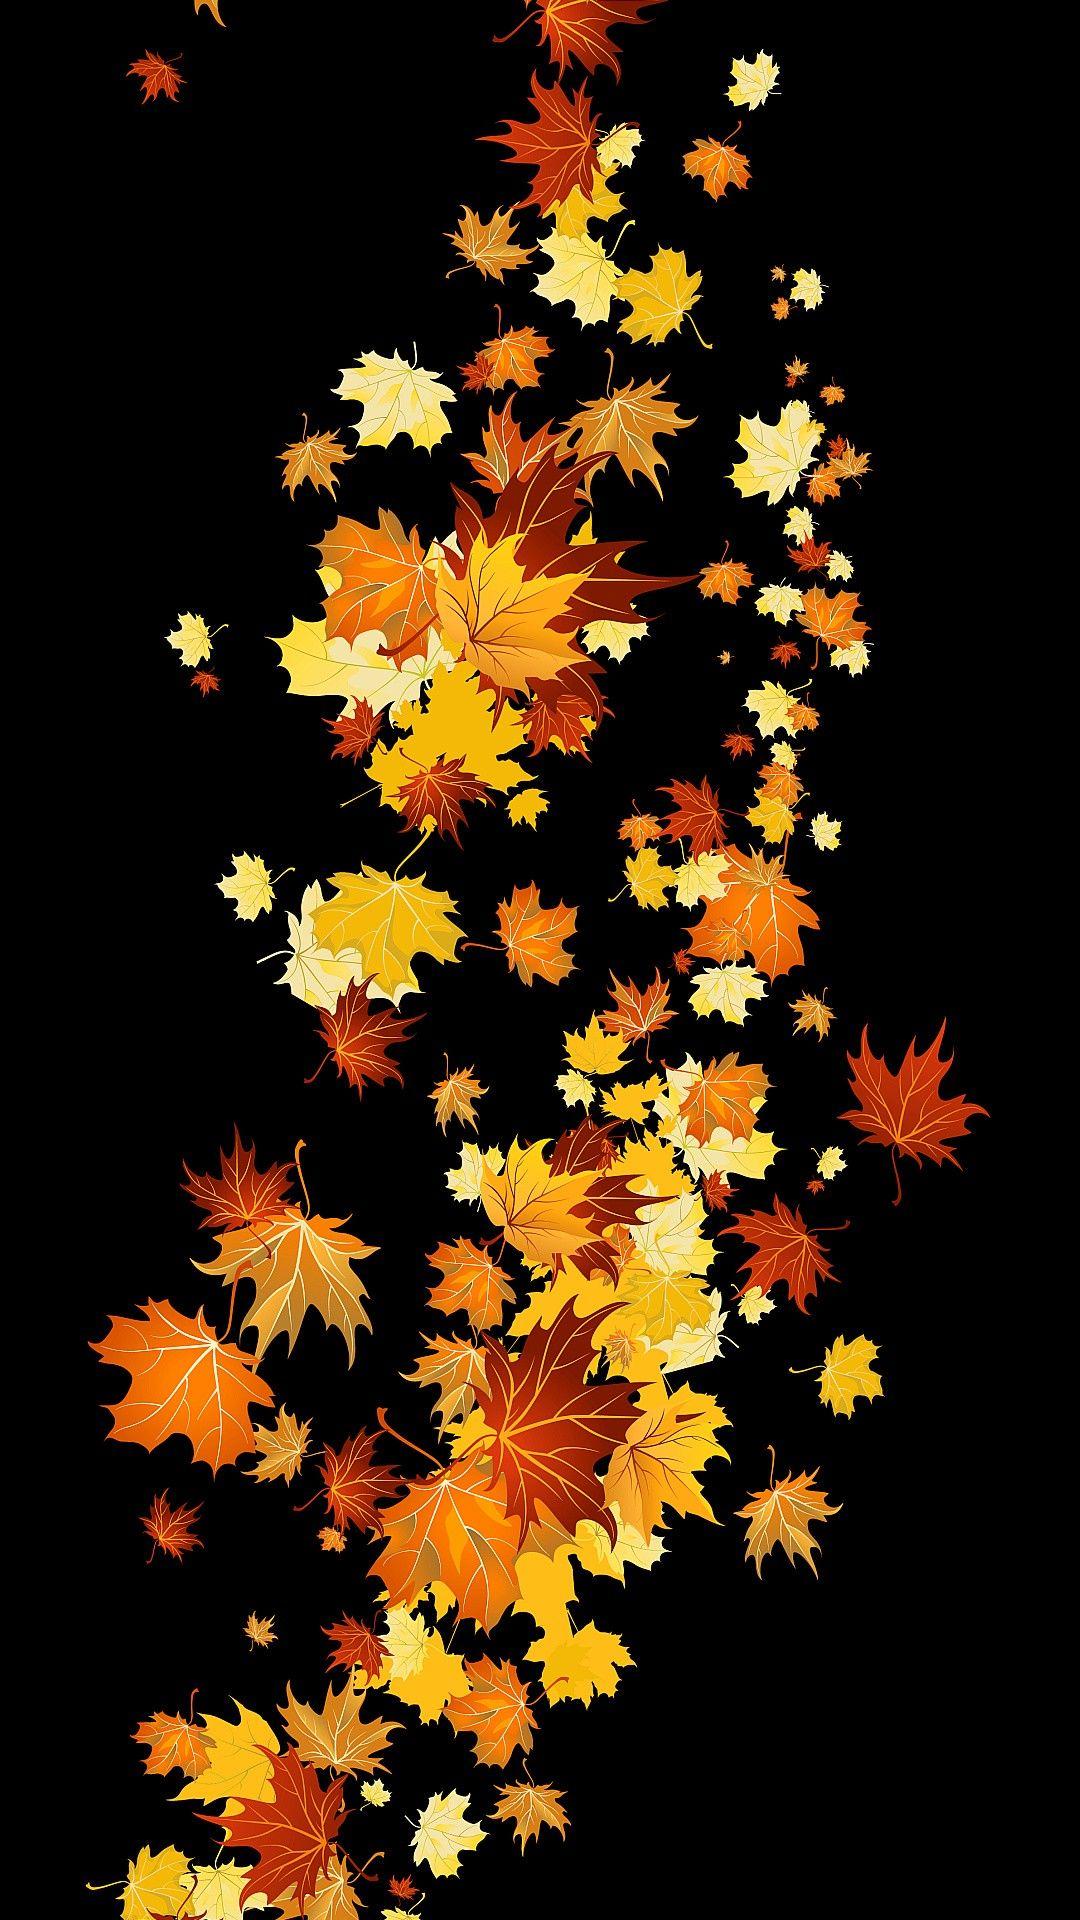 Pin by zryan on wallpaper phone Autumn leaves wallpaper